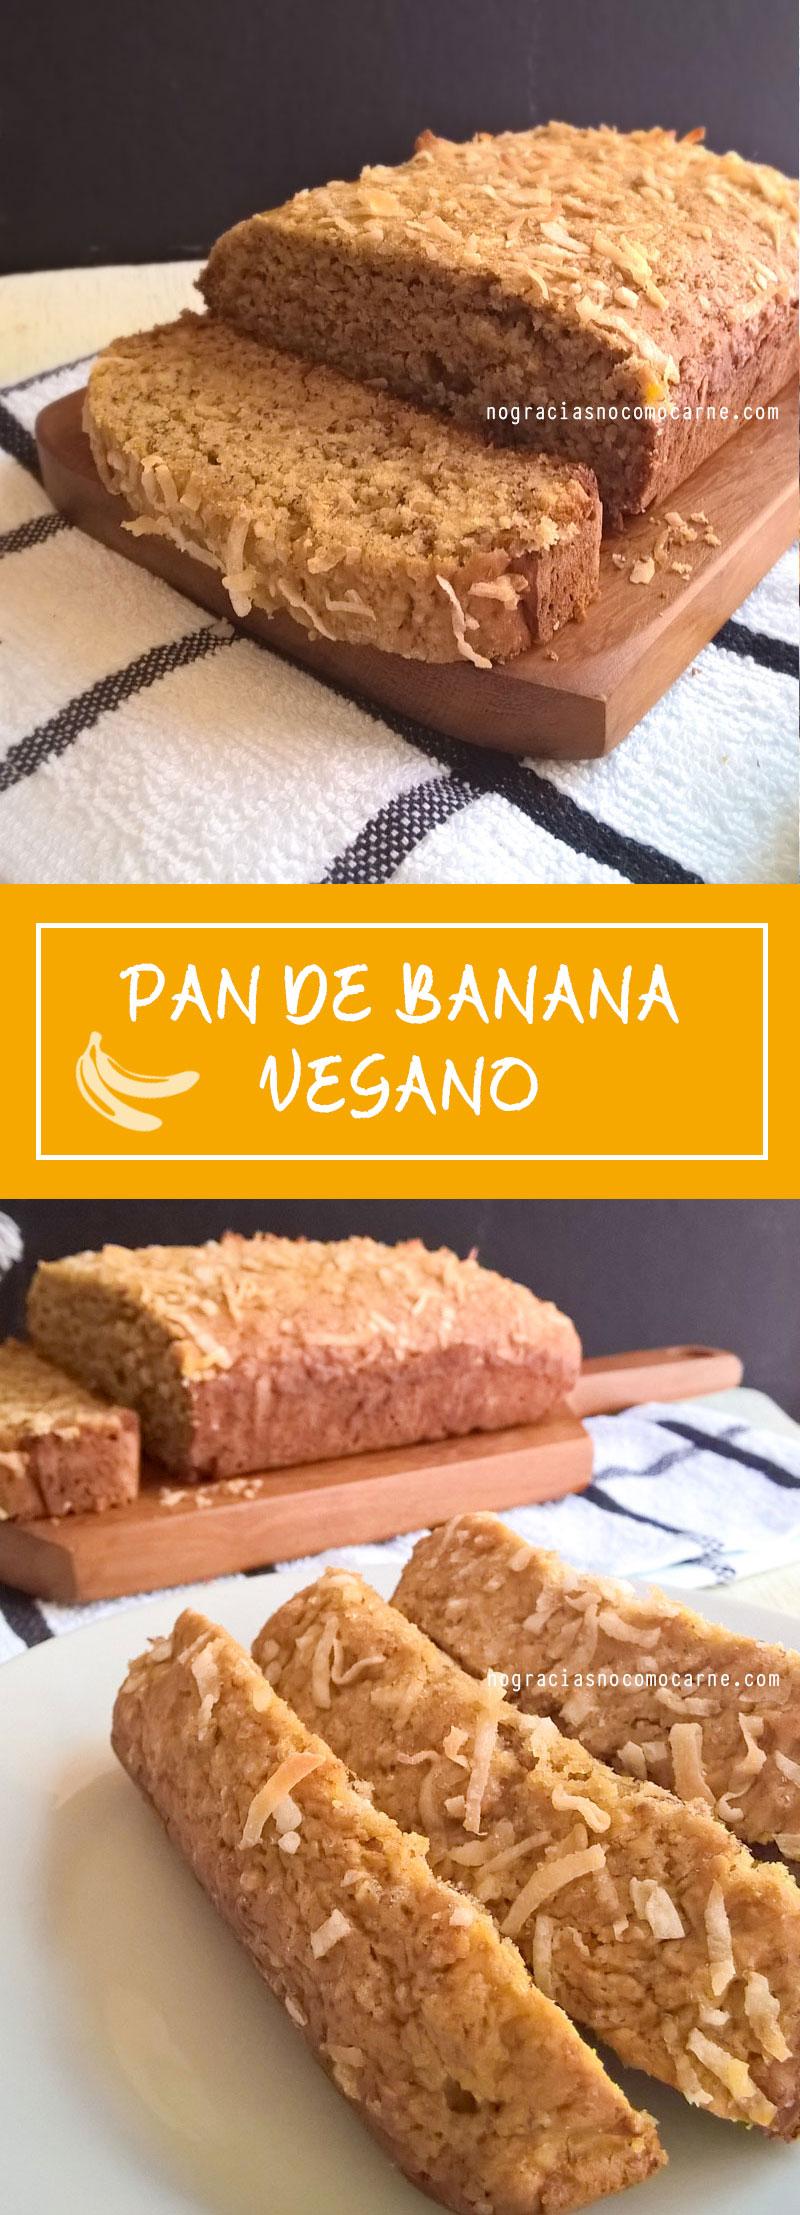 Pan de banana vegano | No gracias, no como carne